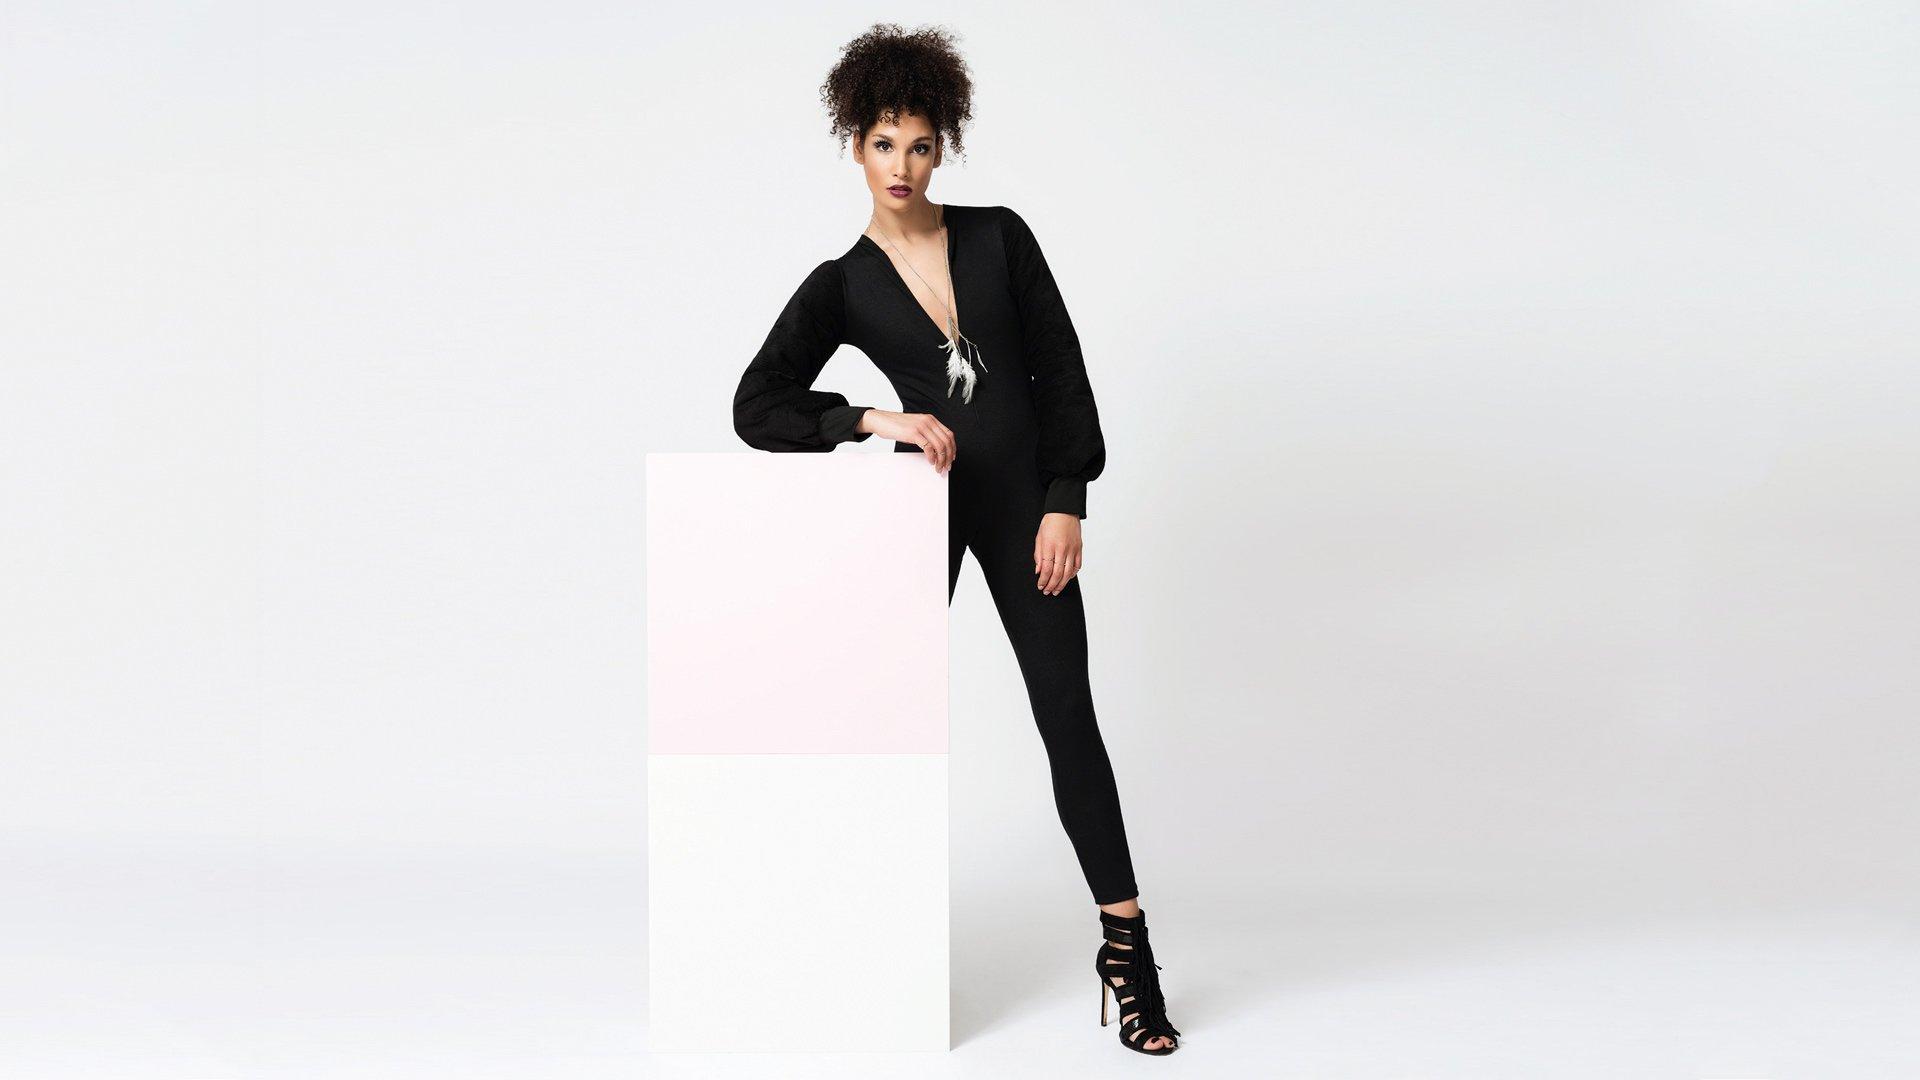 Fashion Photographers Studio Birmingham